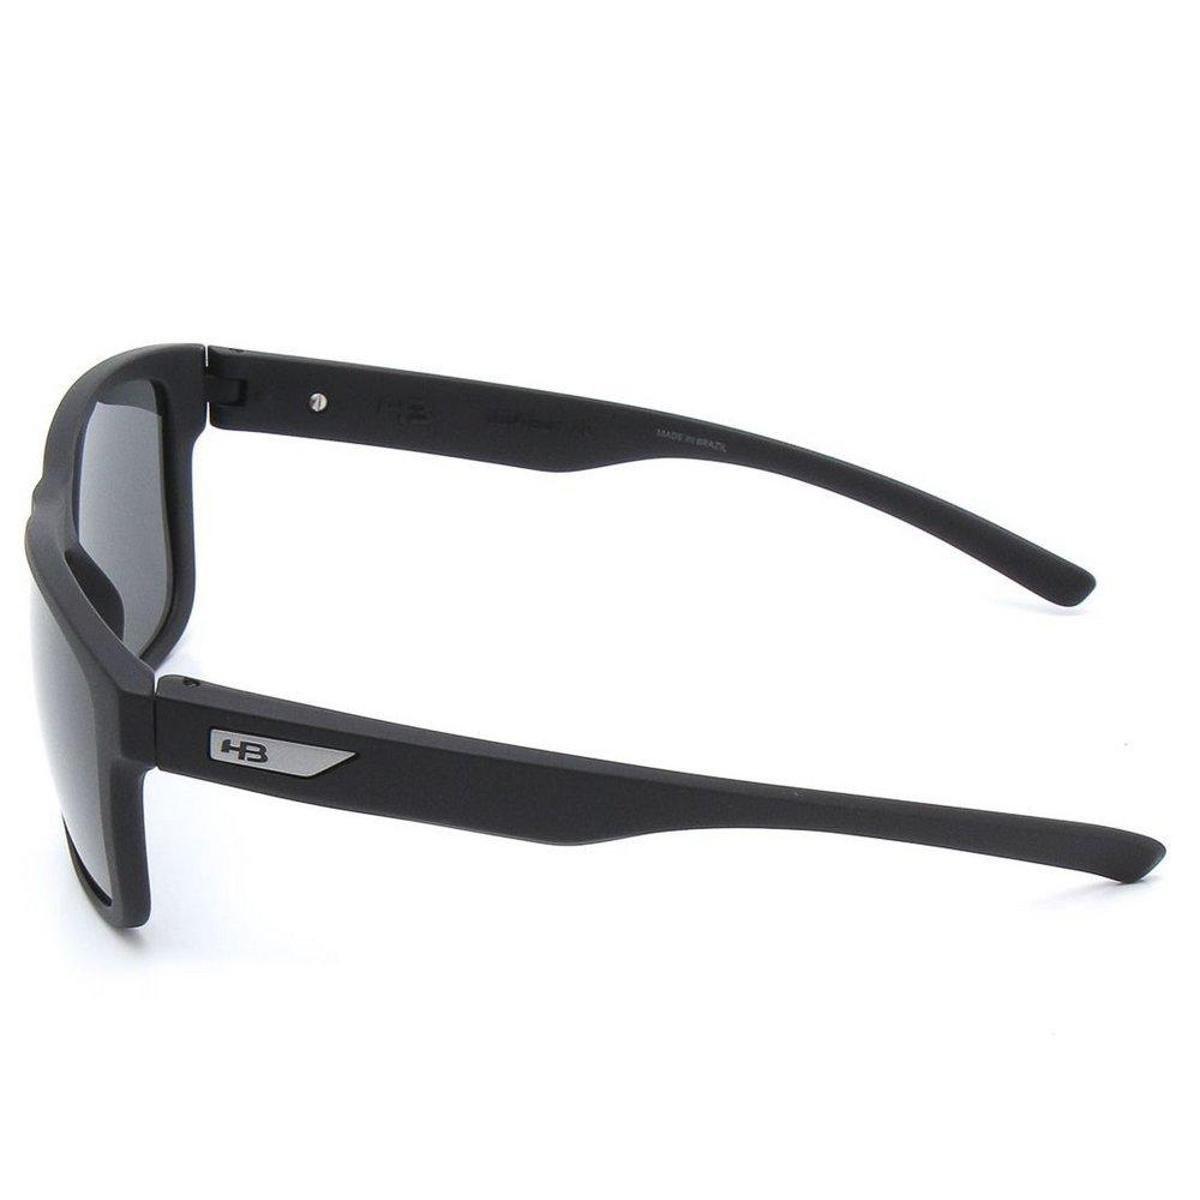 Óculos de Sol HB H-Bomb - Preto e Prata - Compre Agora   Netshoes f19f6507a1